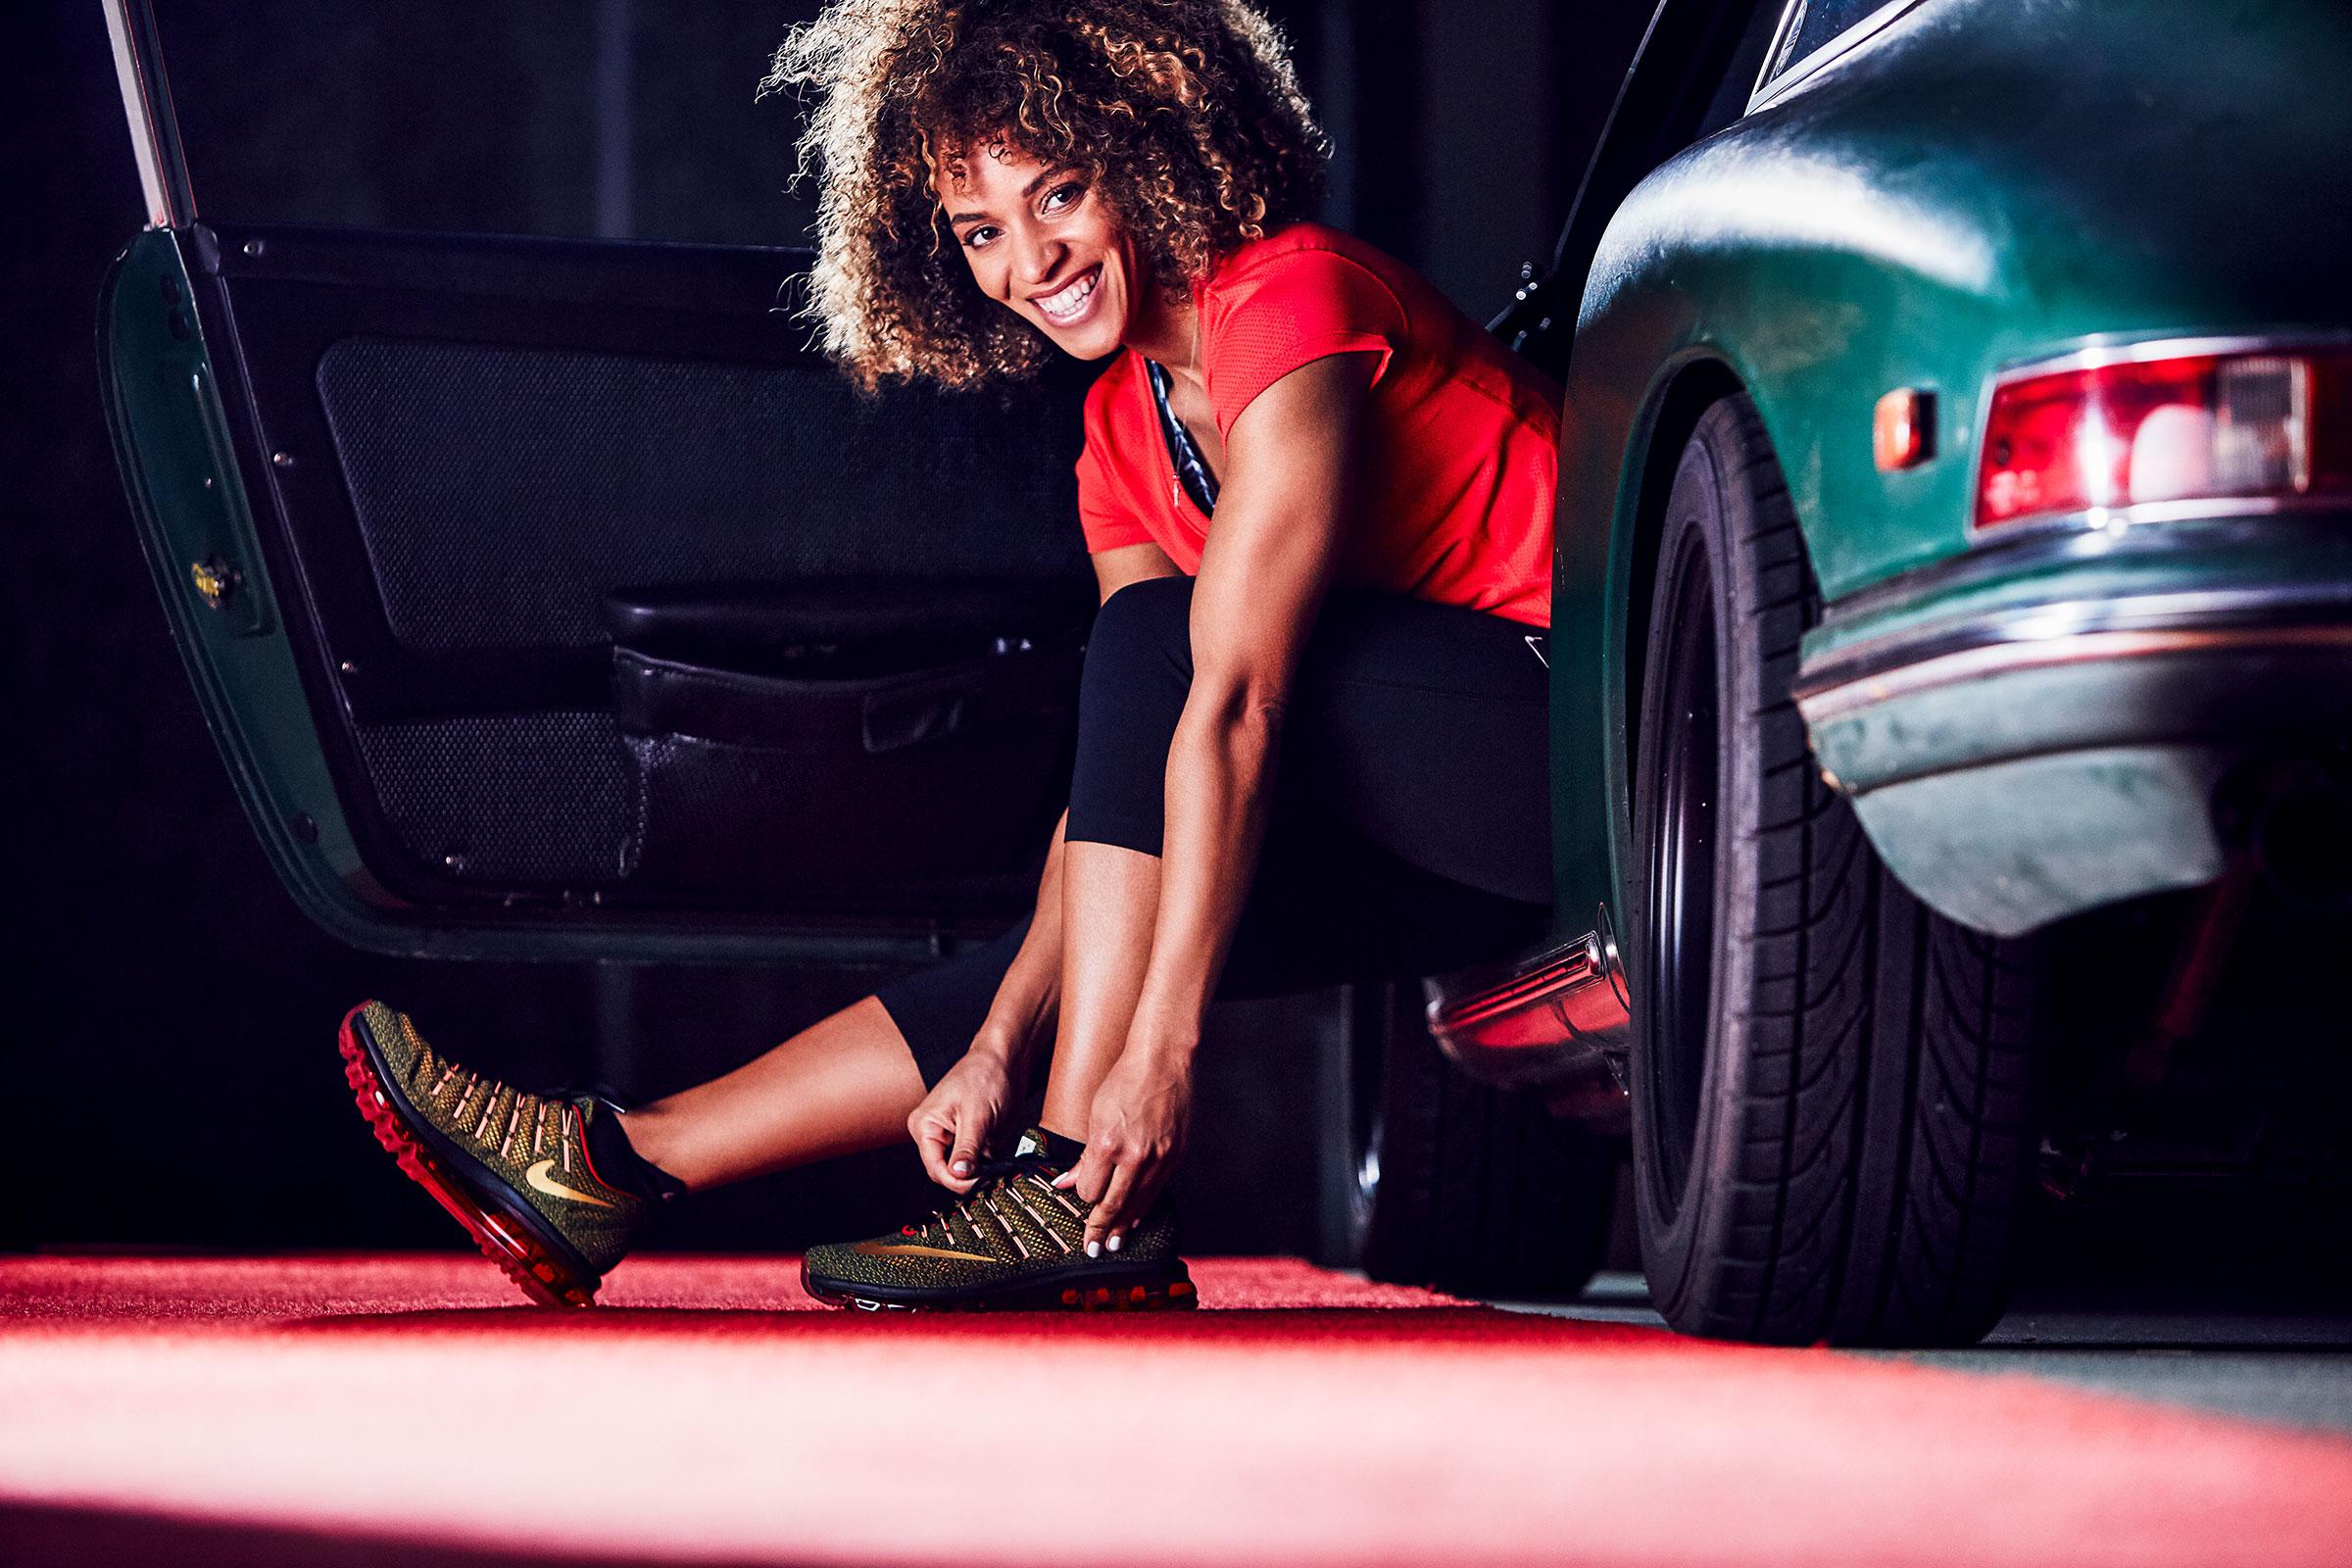 Nike Red Carpet Campaign shot by River Jordan